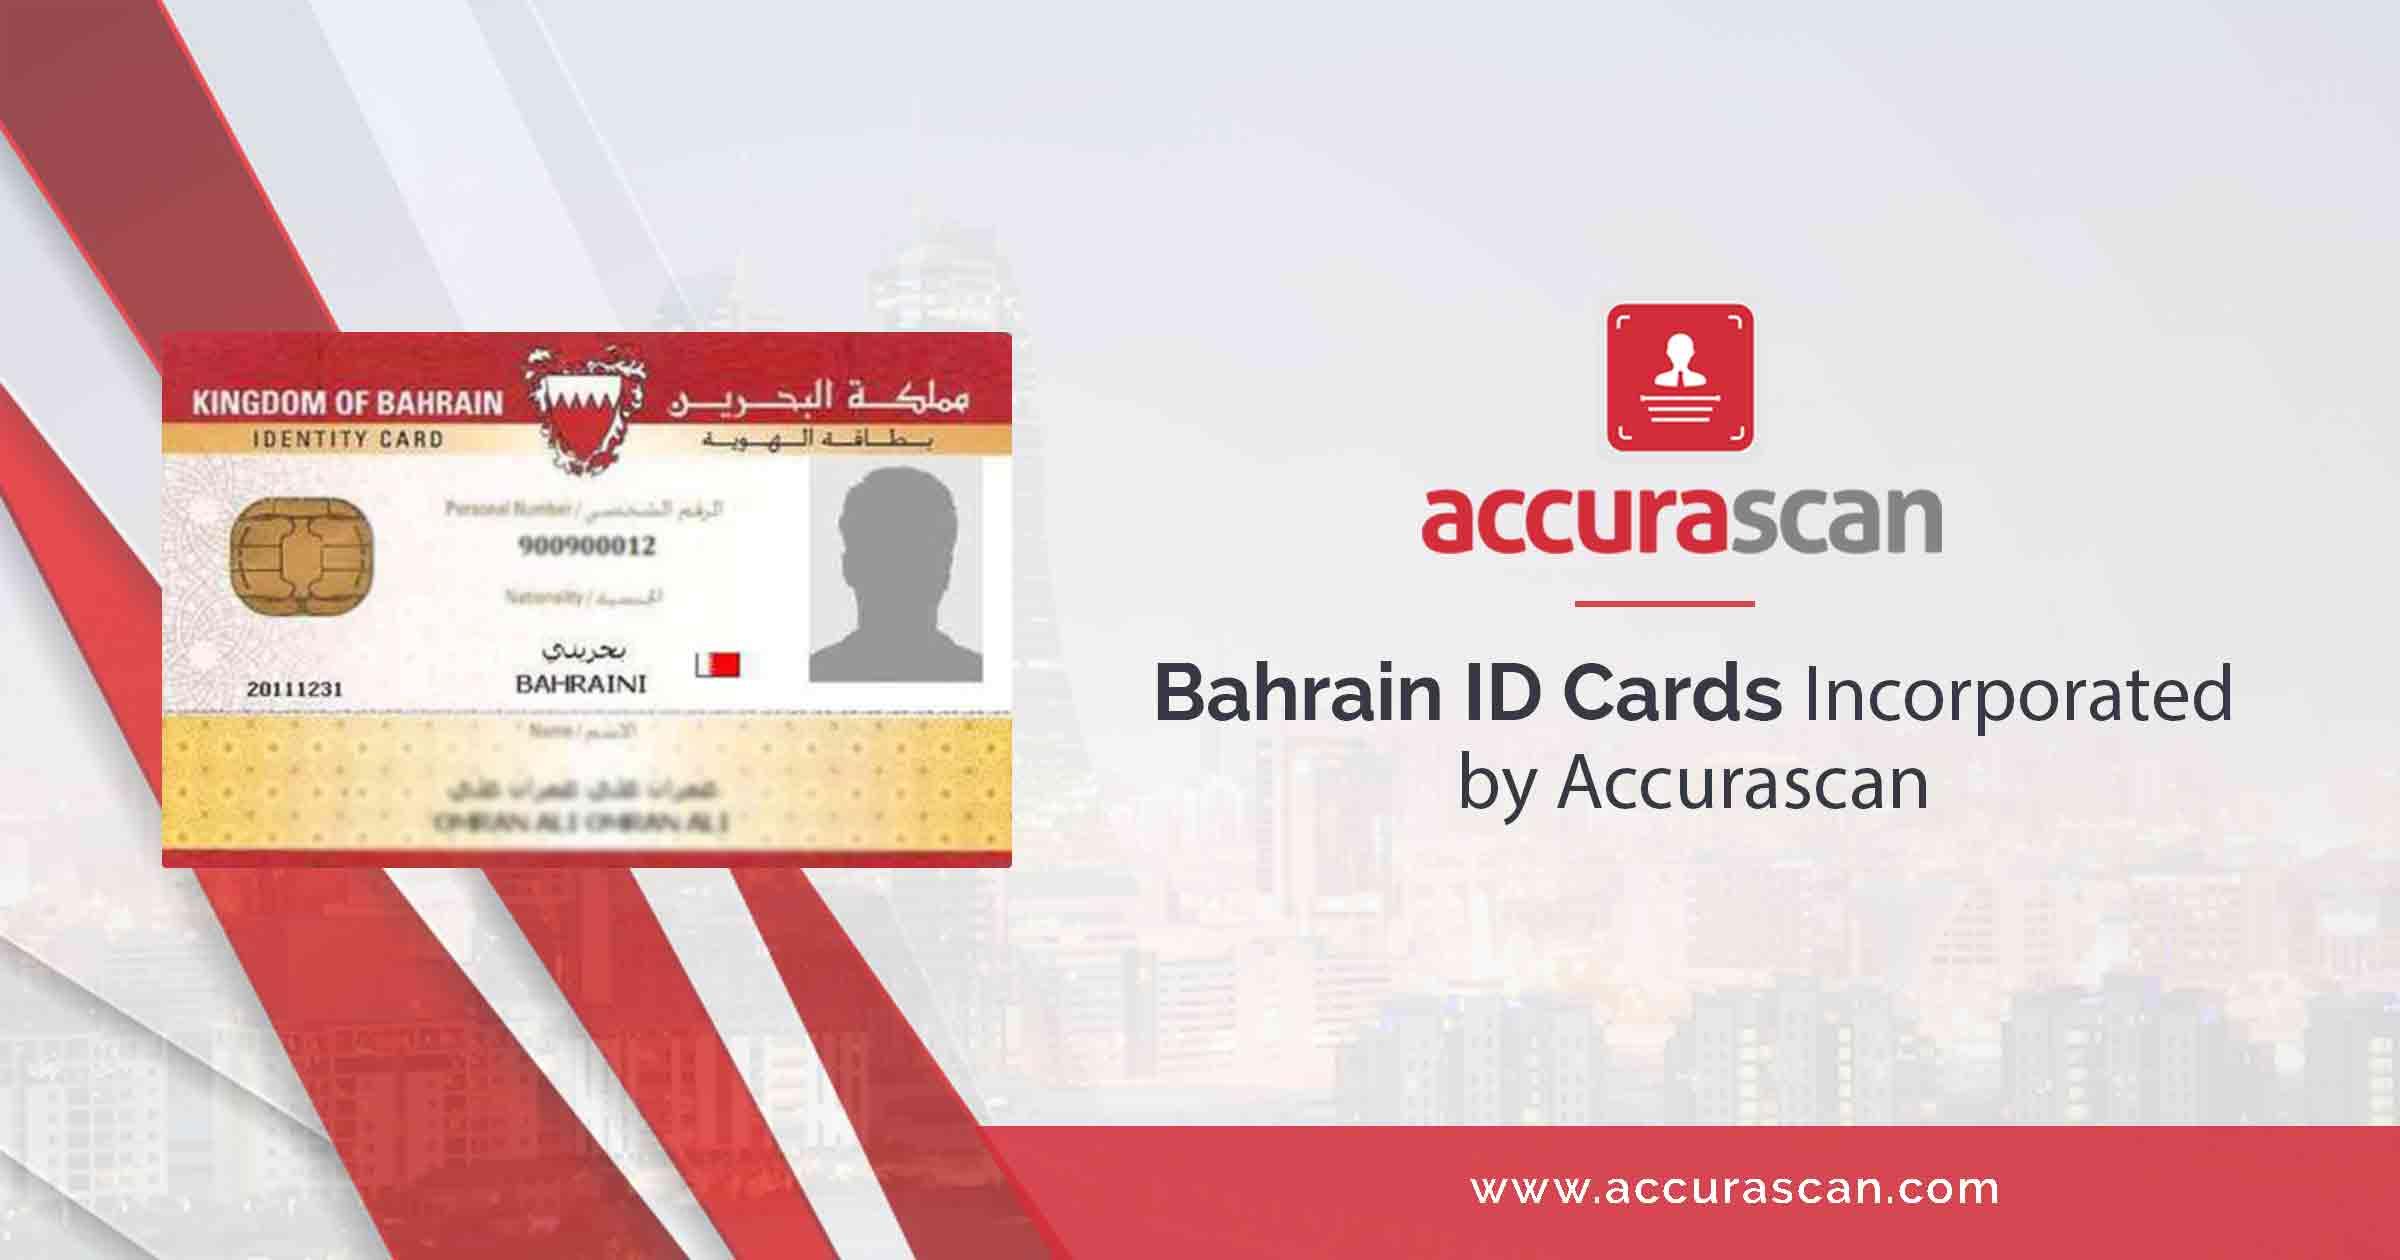 bahrain id cards incorporatedaccurascan